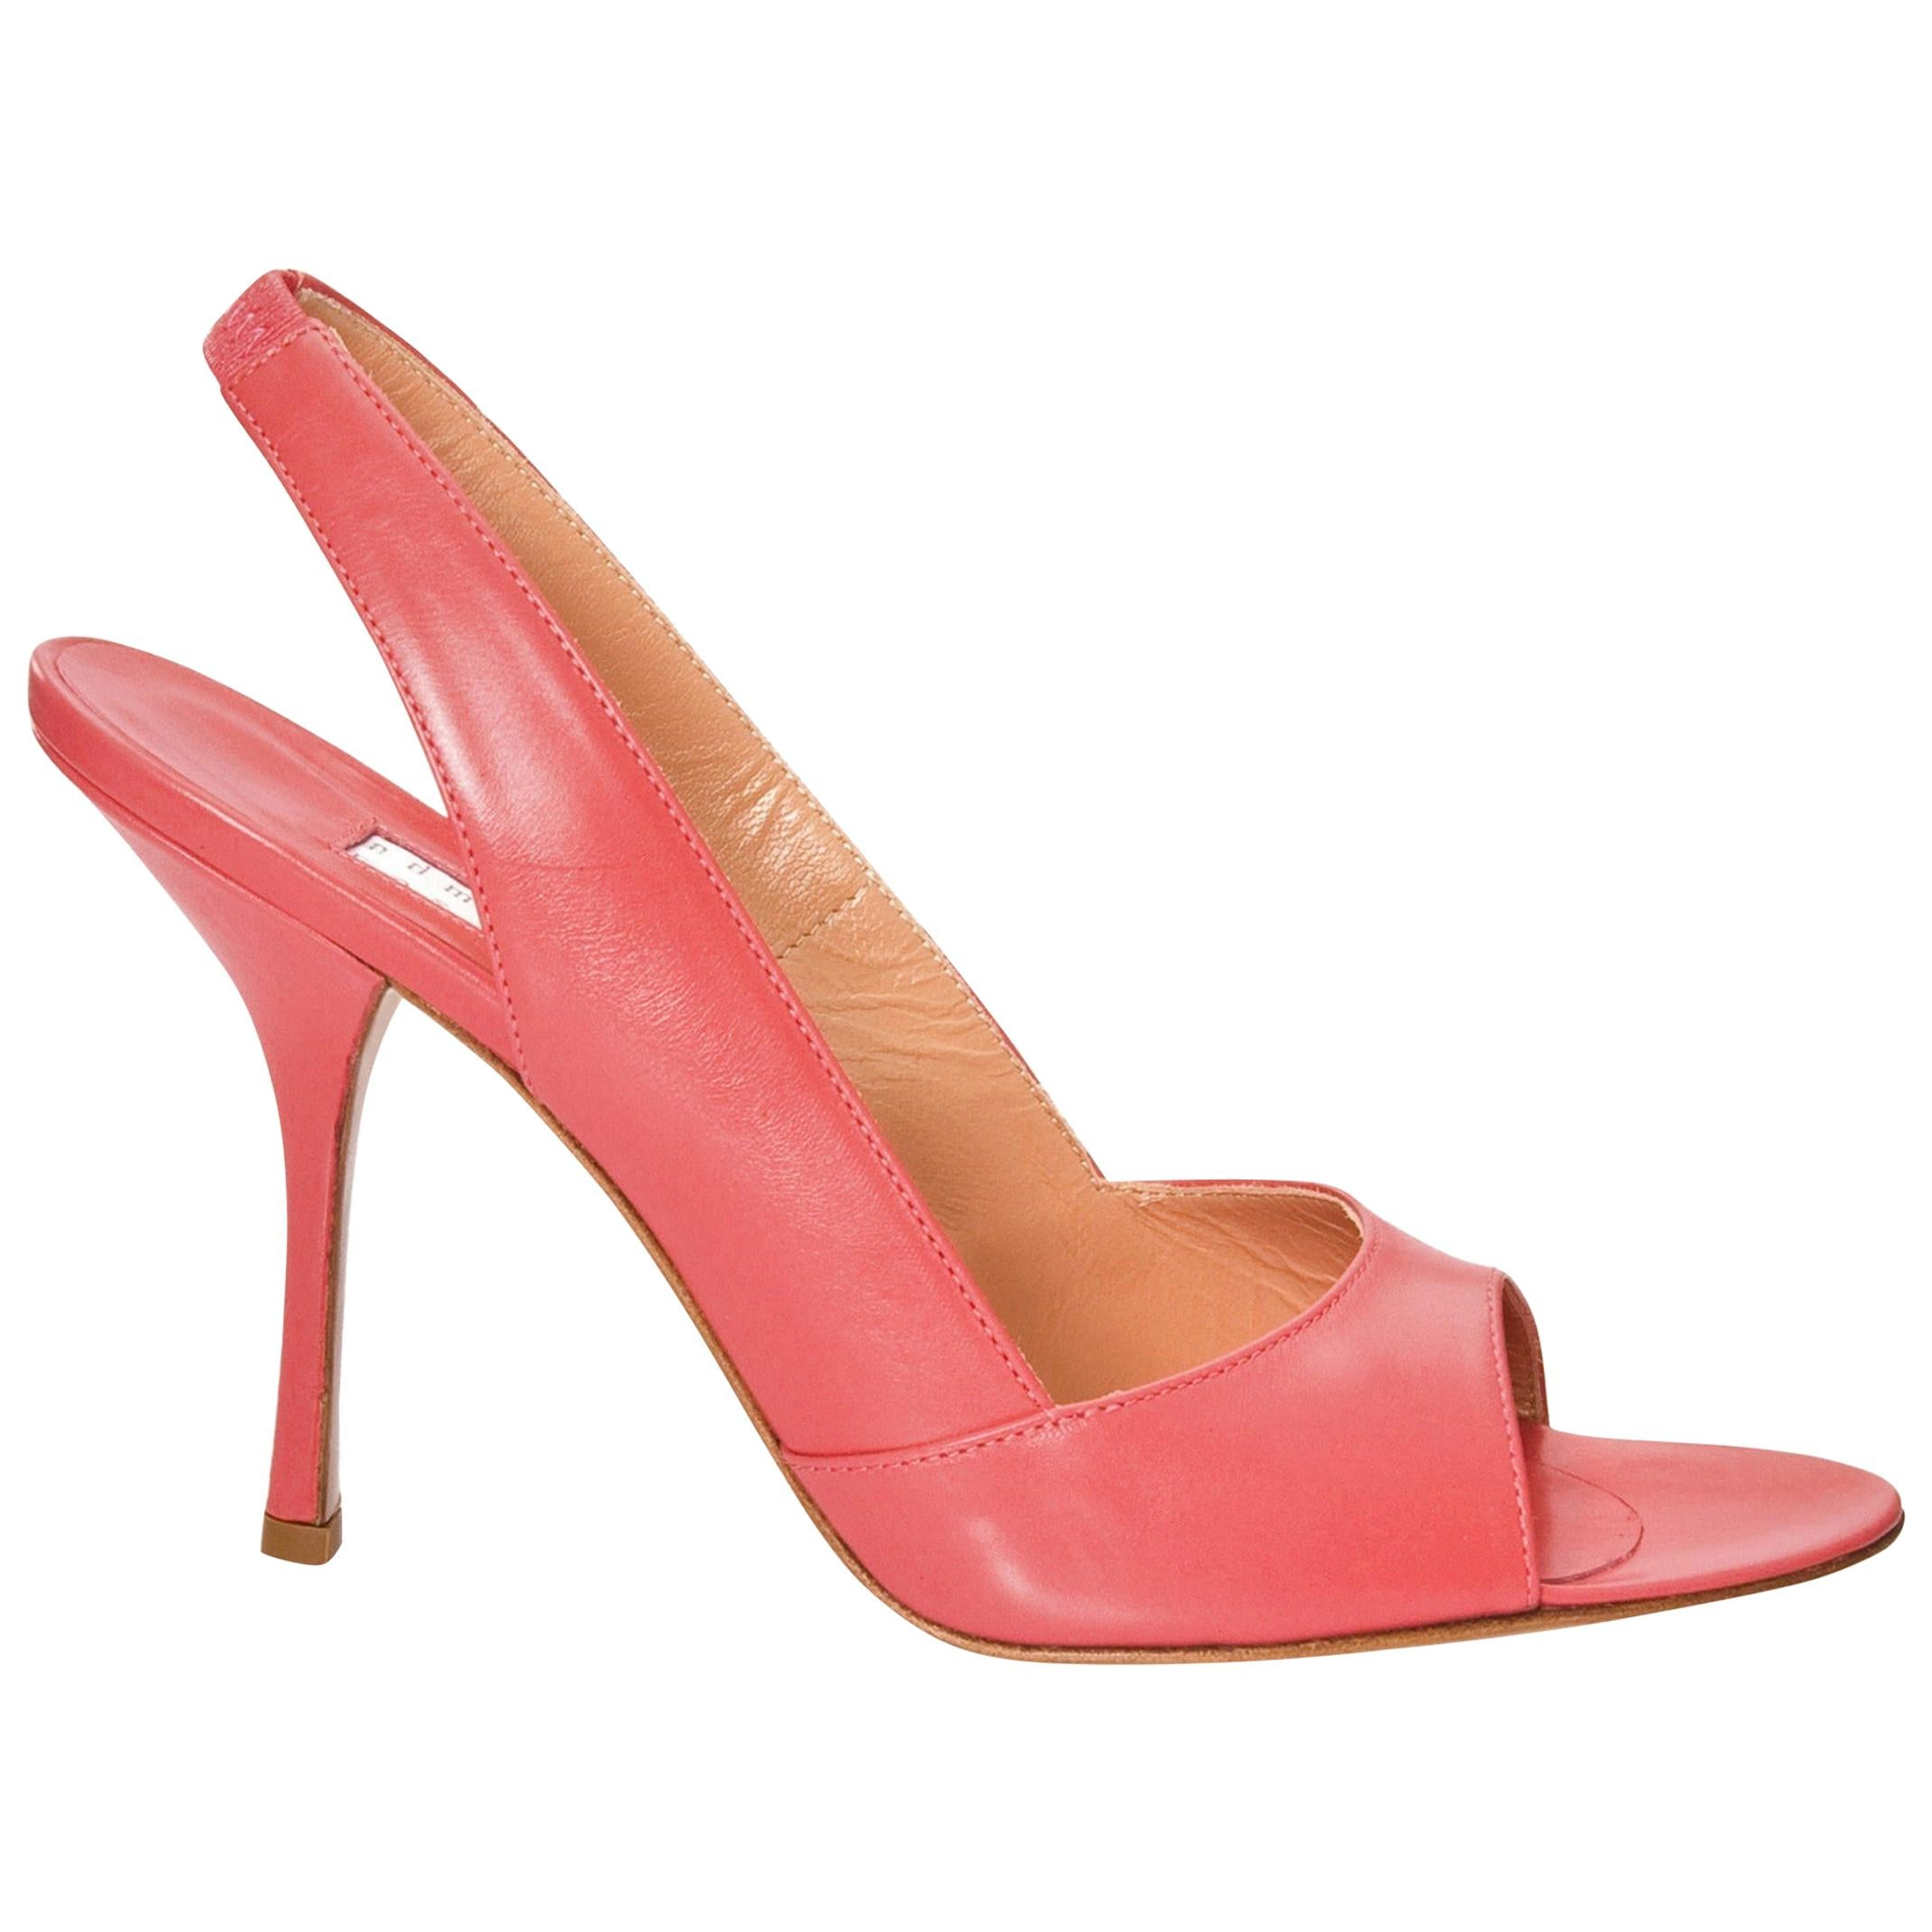 New Edmundo Castillo Coral Leather Sling Heels Sz 7.5